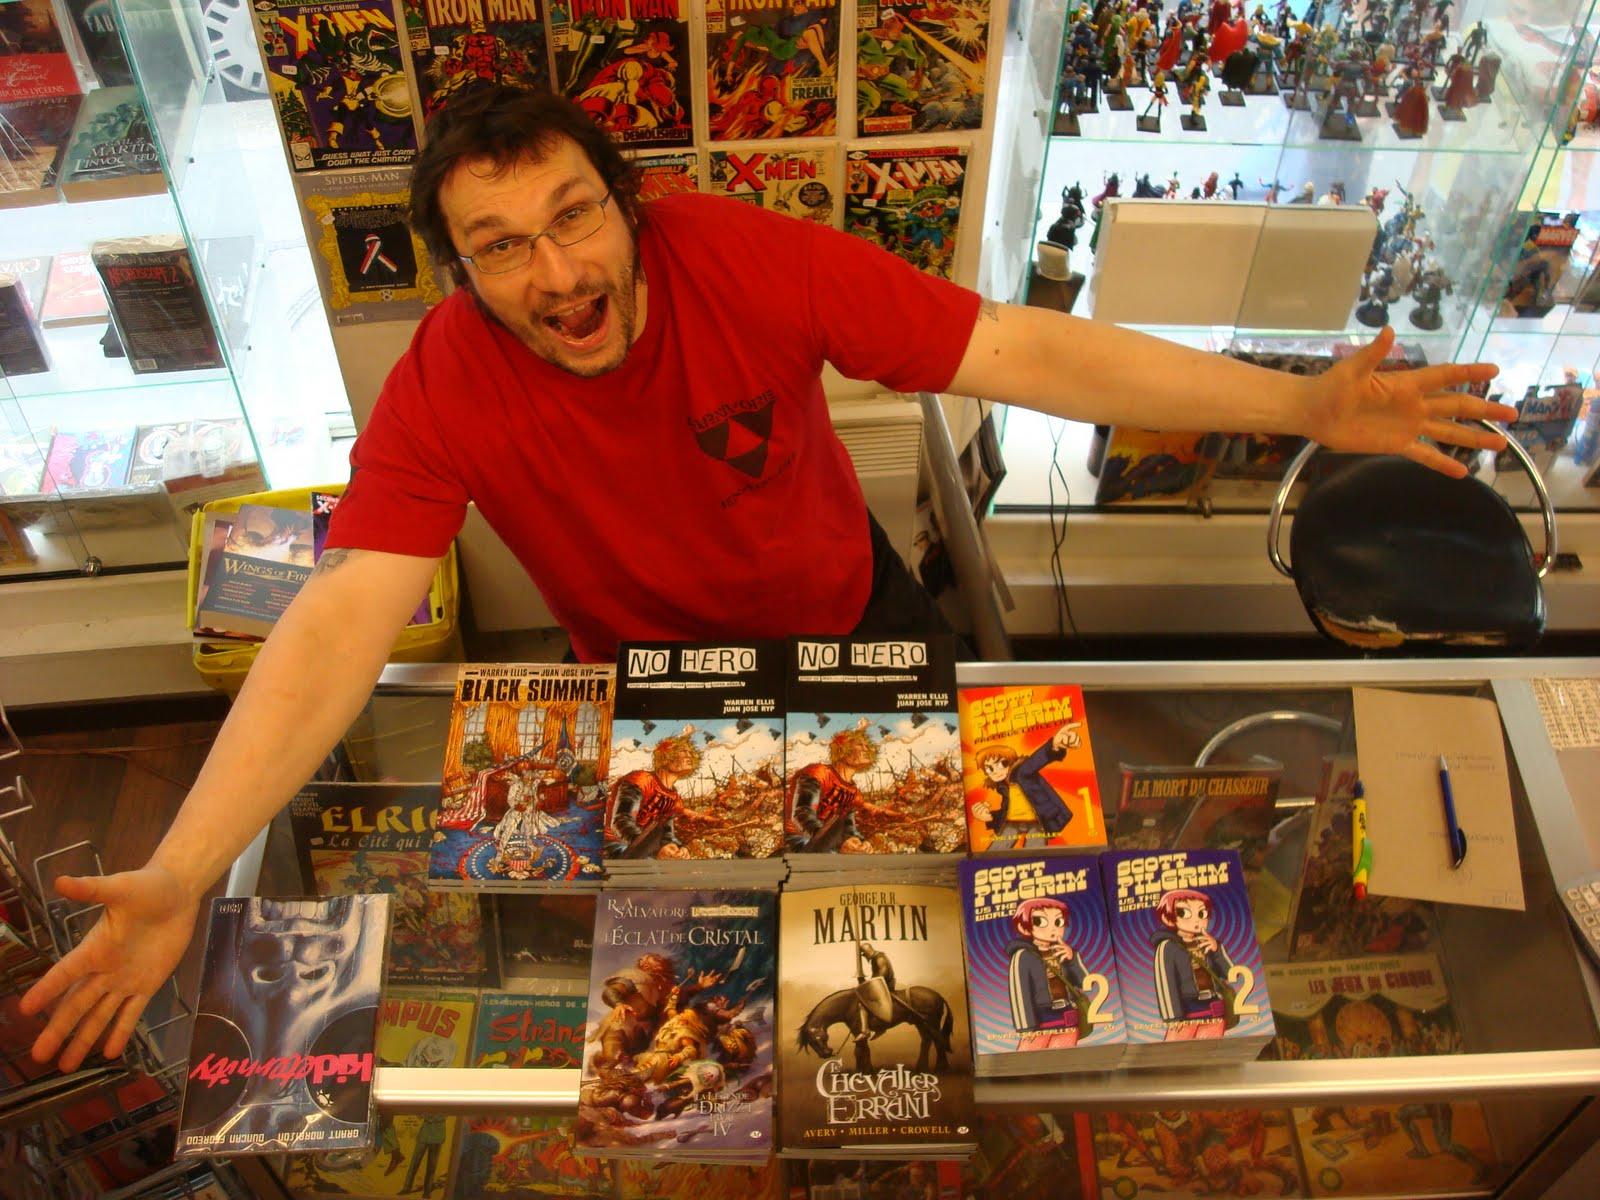 http://2.bp.blogspot.com/_b658hNHs1Sw/TBDCBdji-aI/AAAAAAAAFHk/ZILoOw52Ctw/s1600/Geg+Maga+extatique+devant+les+nouveaut%C3%A9s+Milady+Graphics+%C3%A0+Arkham+Comics+7+rue+Broca+75005+Paris.JPG